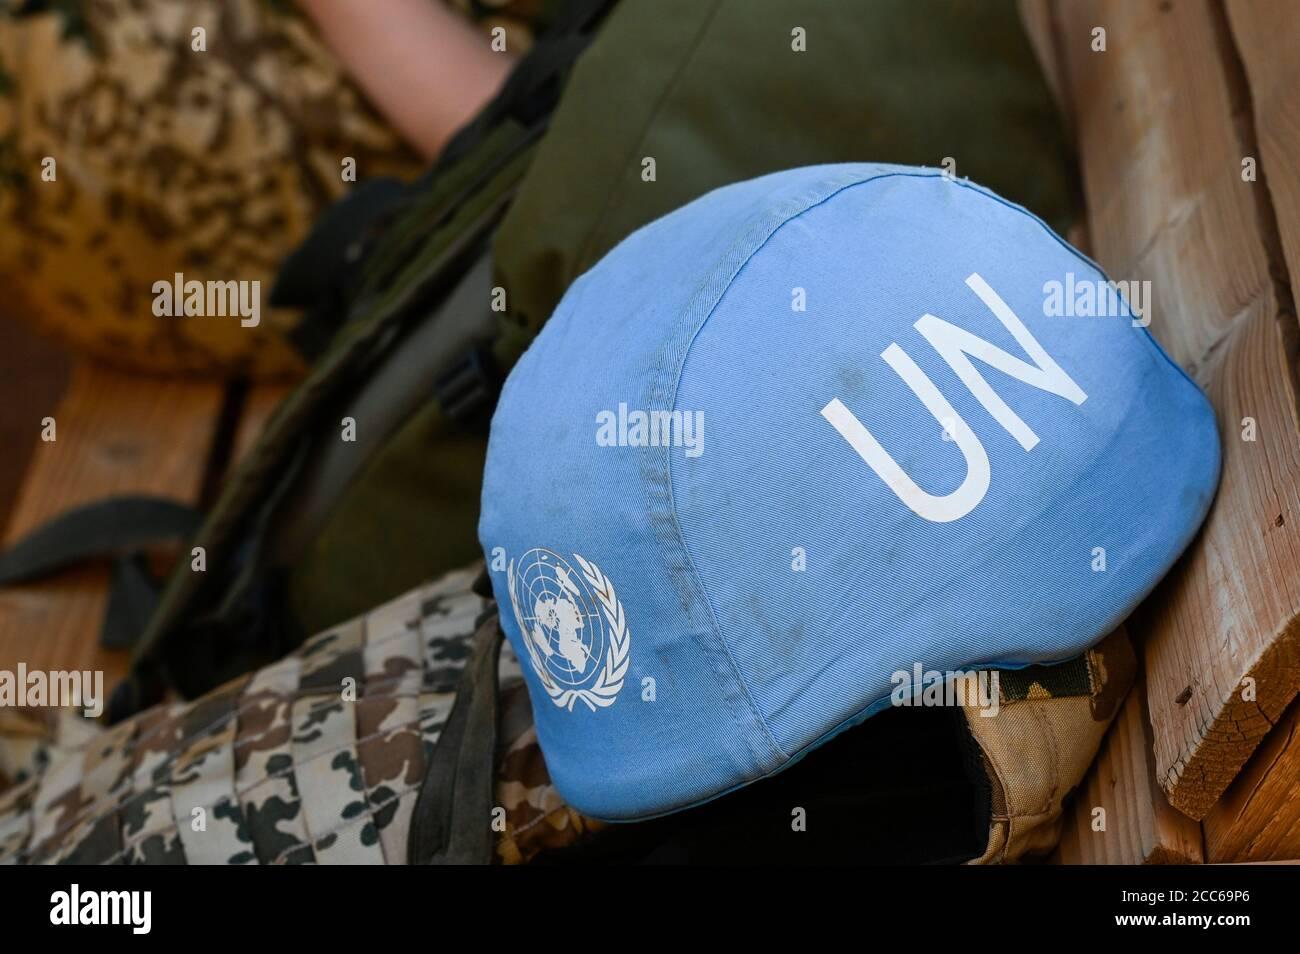 MALI, Gao, Minusma UN peace keeping mission, Camp Castor, german army Bundeswehr, blue helmet of UN / Blauhelm der UNO Stock Photo